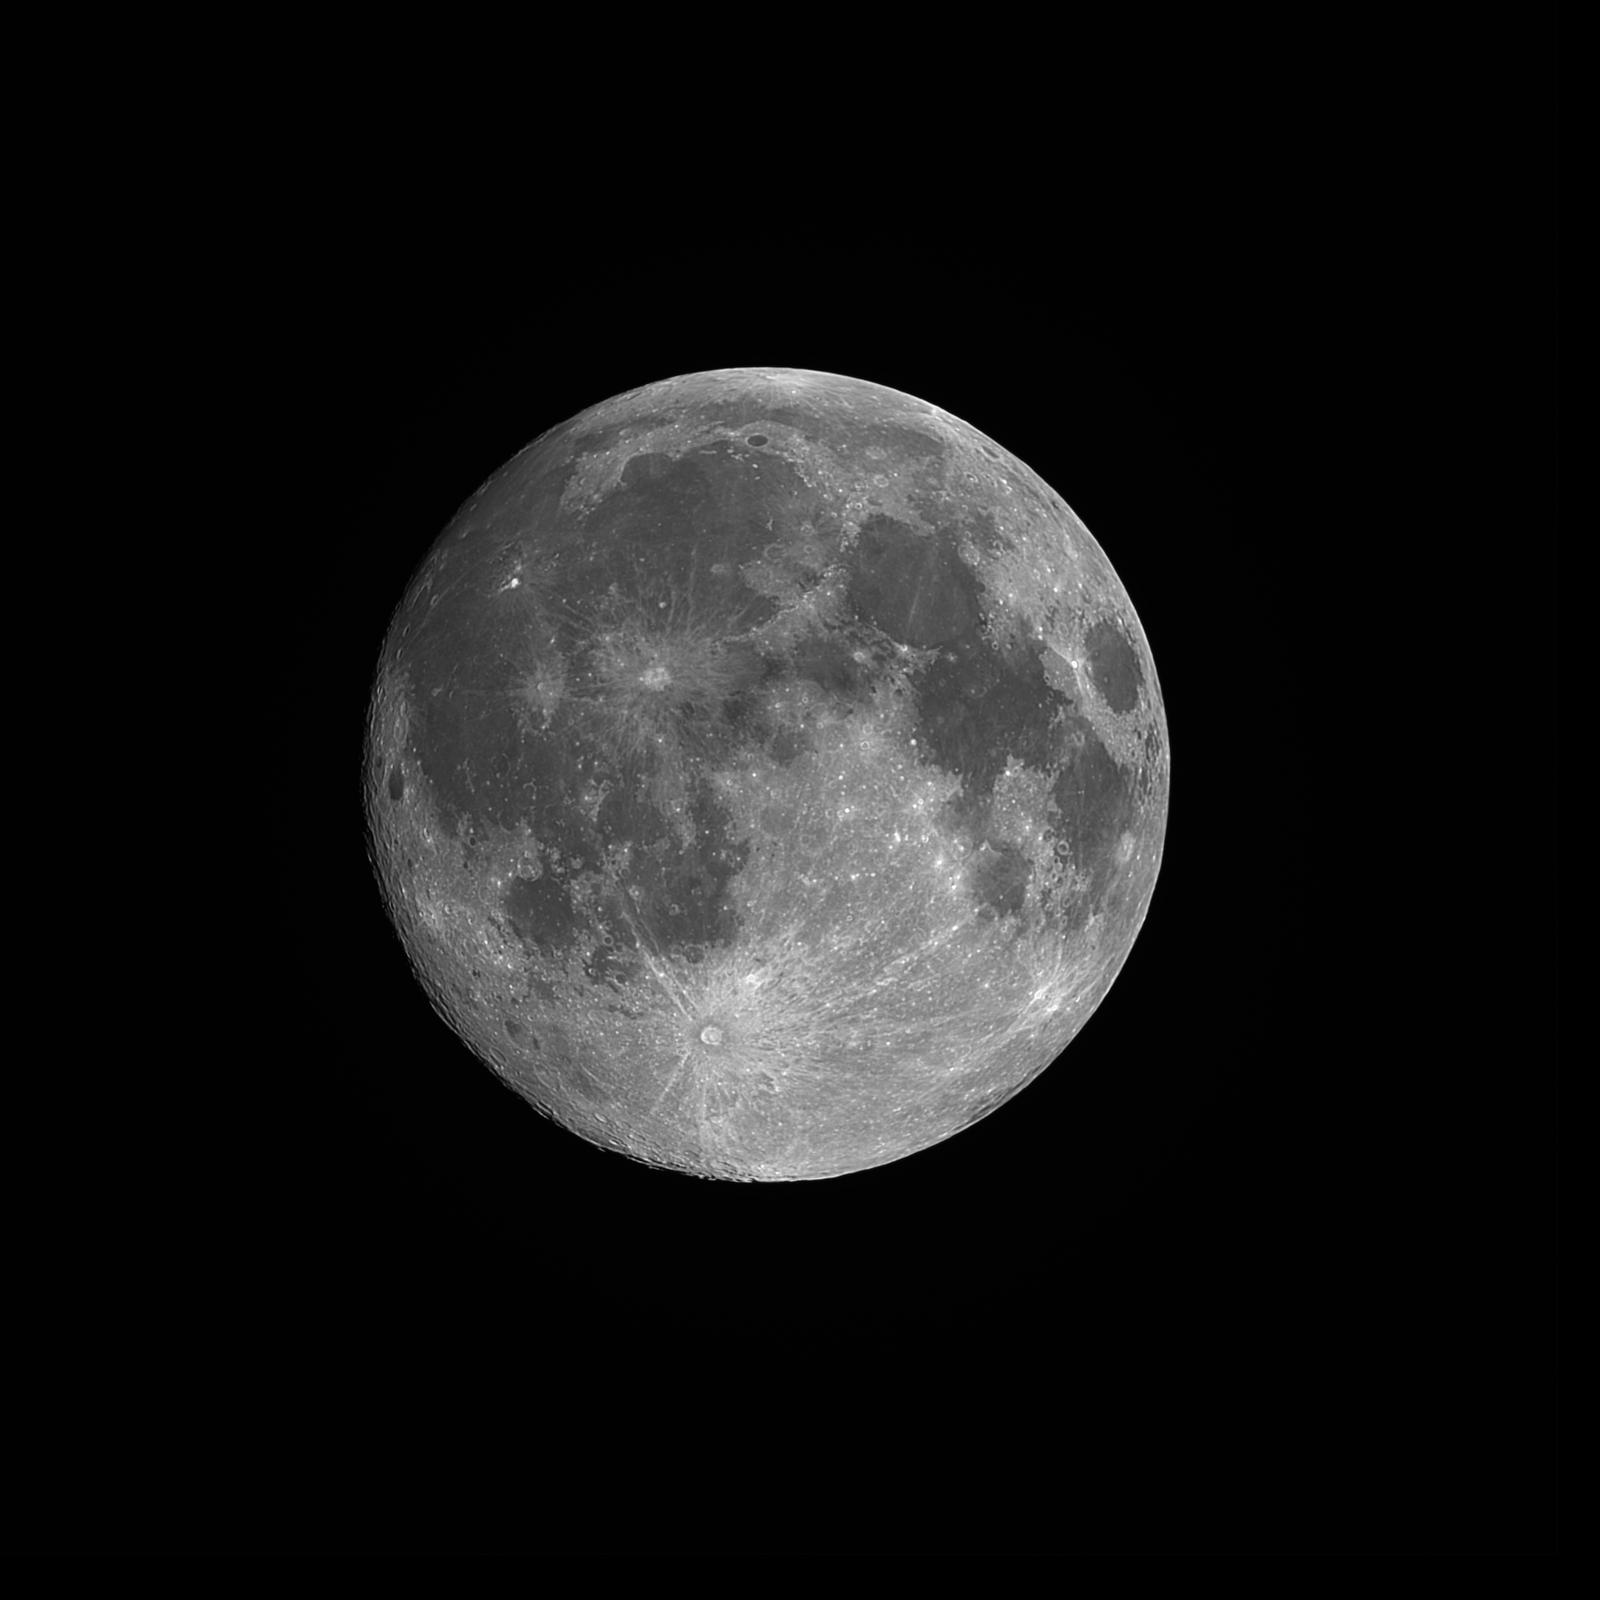 Moon_2020FEB08_20_45_01_1600px.jpg